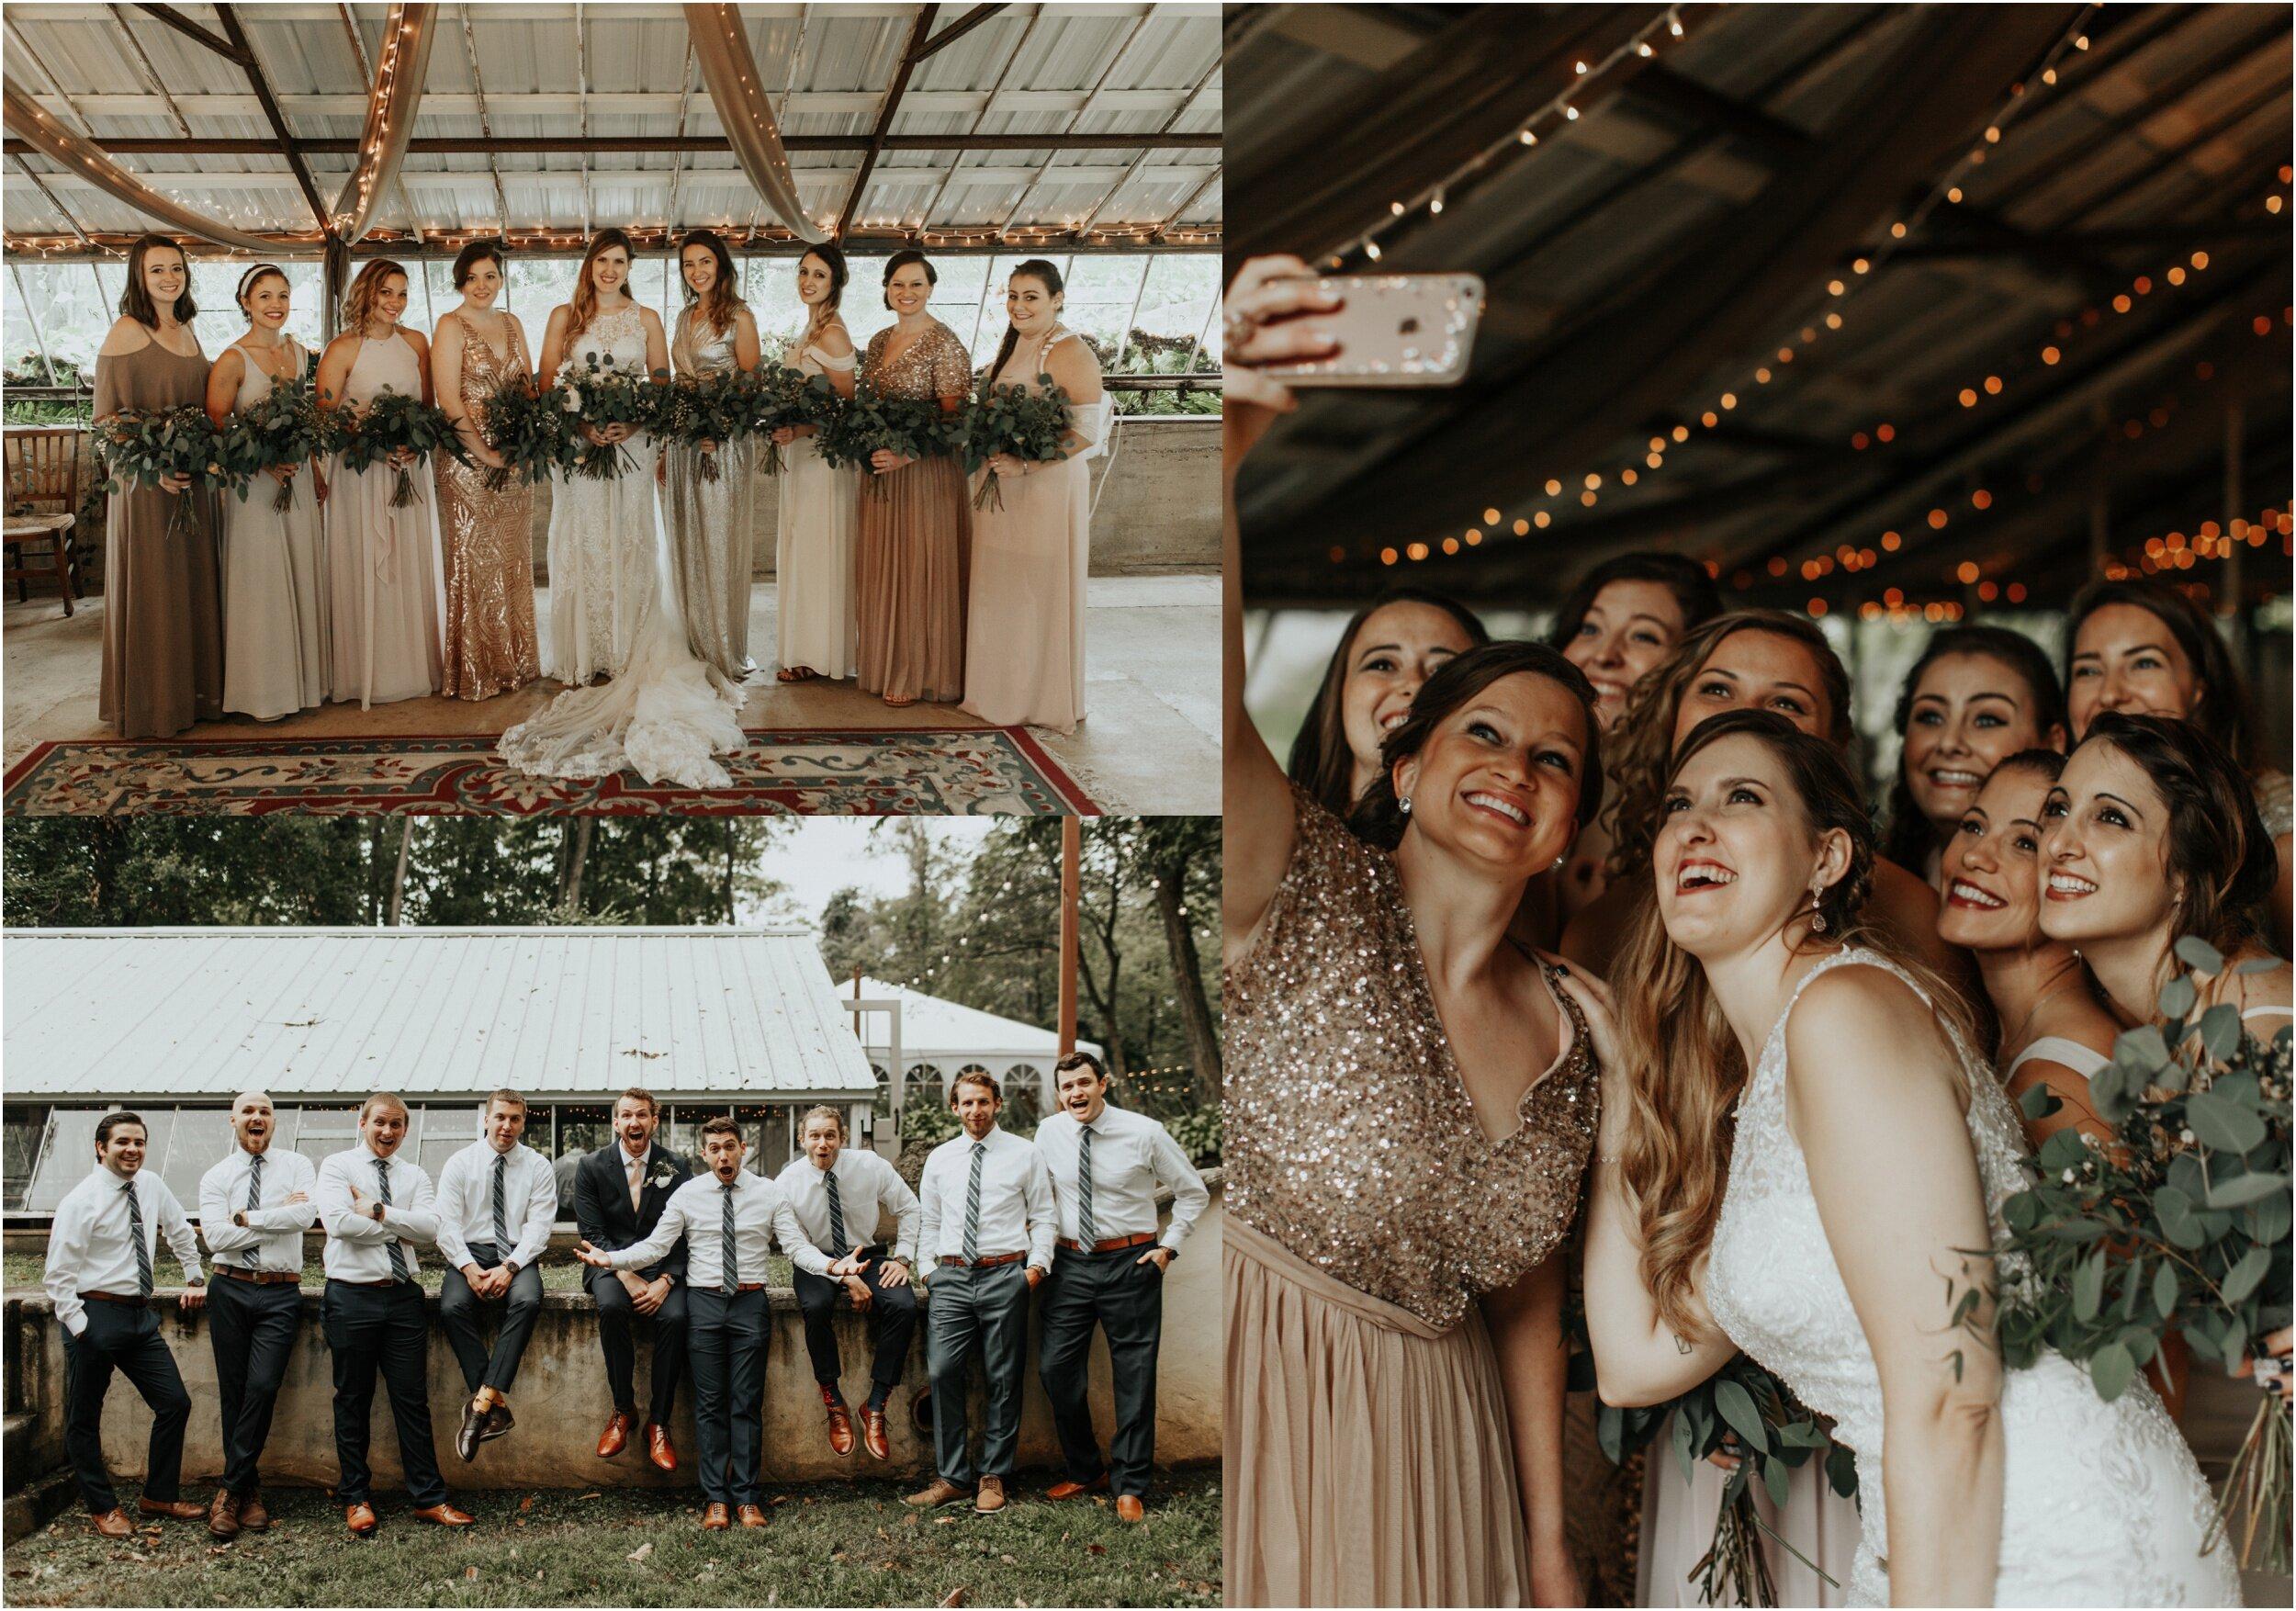 steph-and-jordan-cox-our-wedding-historic-shady-lane-compass-wedding-collective-hazel-lining-photography-destination-elopement-wedding-engagement-photography_0041.jpg